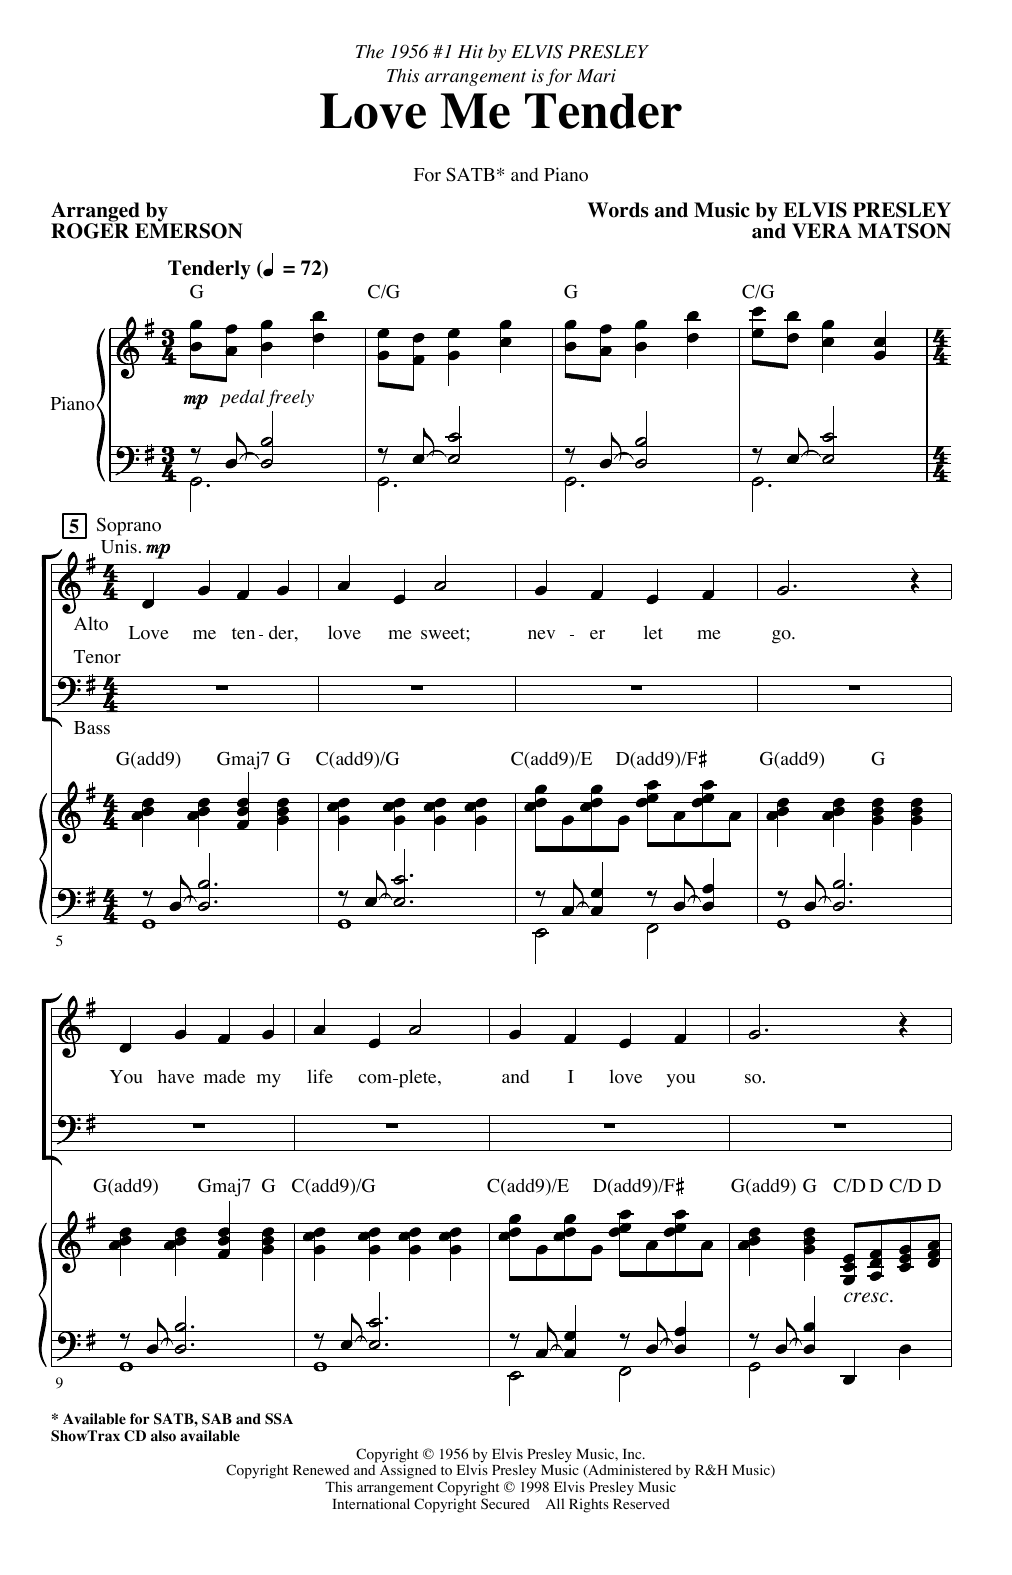 Love Me Tender (arr. Roger Emerson) (SATB Choir)